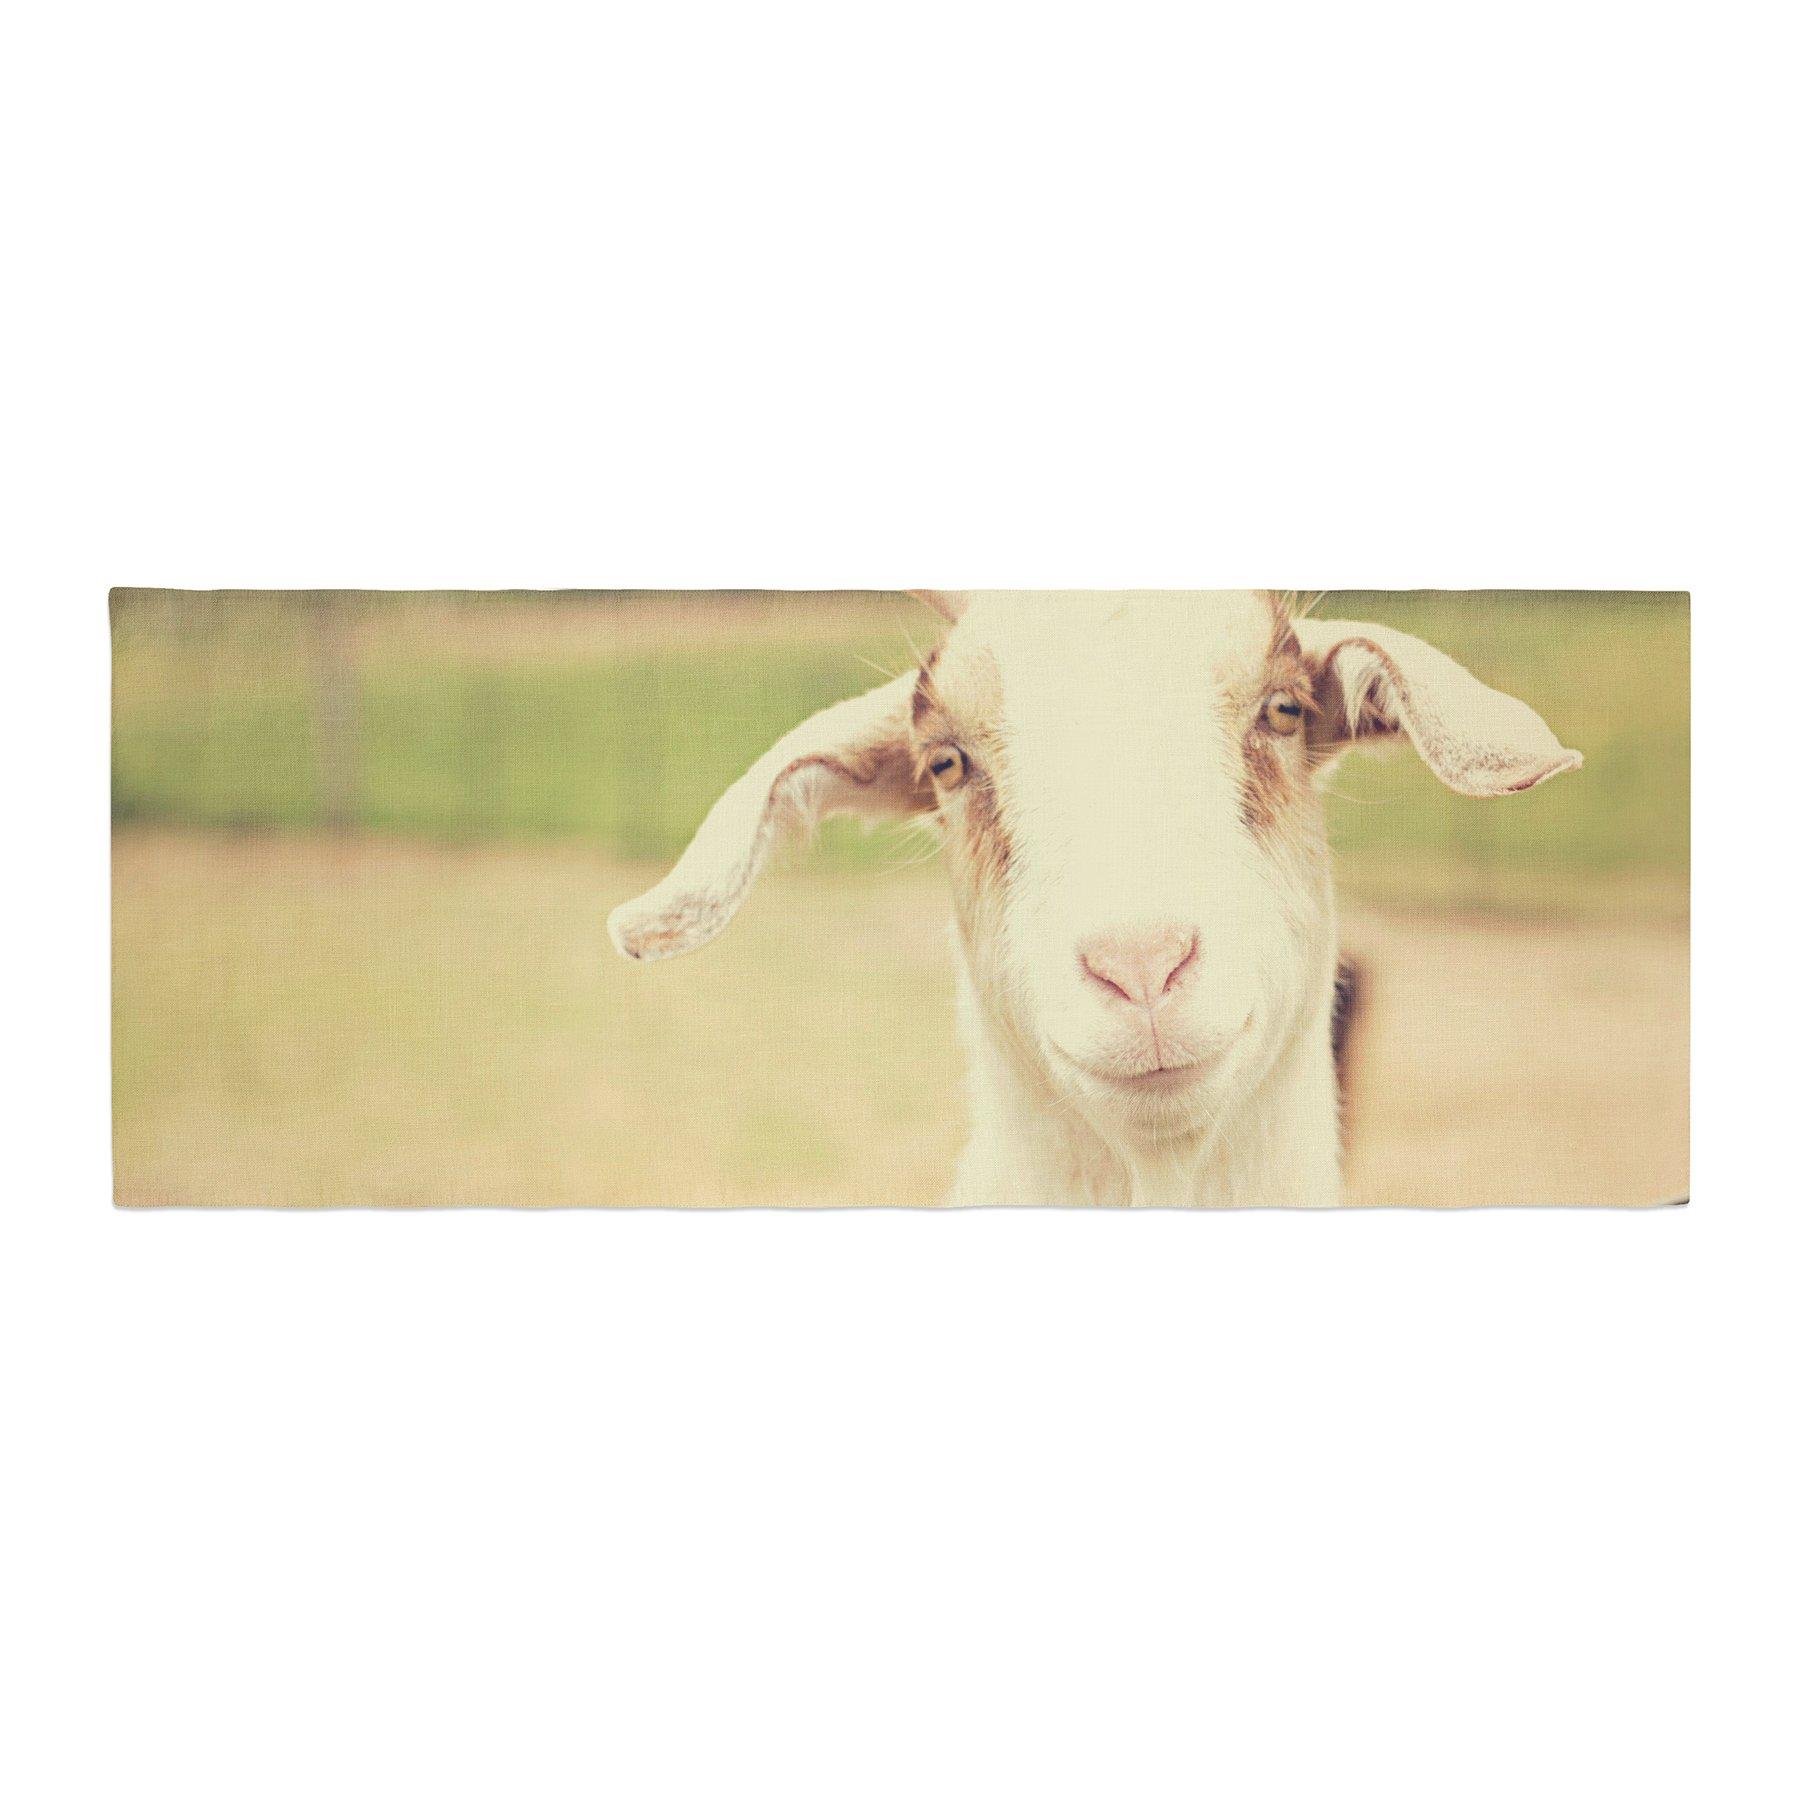 Kess InHouse Angie Turner Happy Goat Smiling Animal Bed Runner, 34'' x 86''